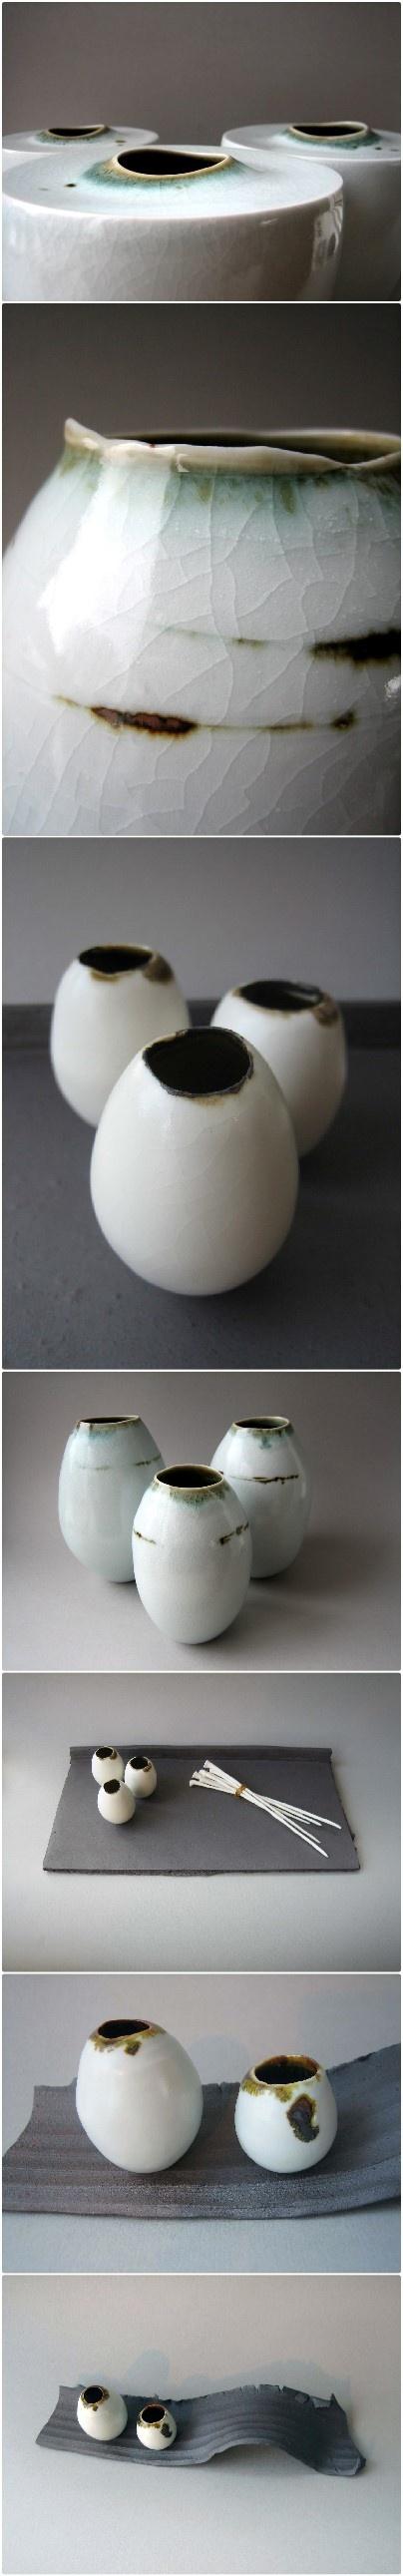 The wonderful works of Elaine Bolt, sensuous ceramics http://www.bilsandrye.com/elaine-bolt.html